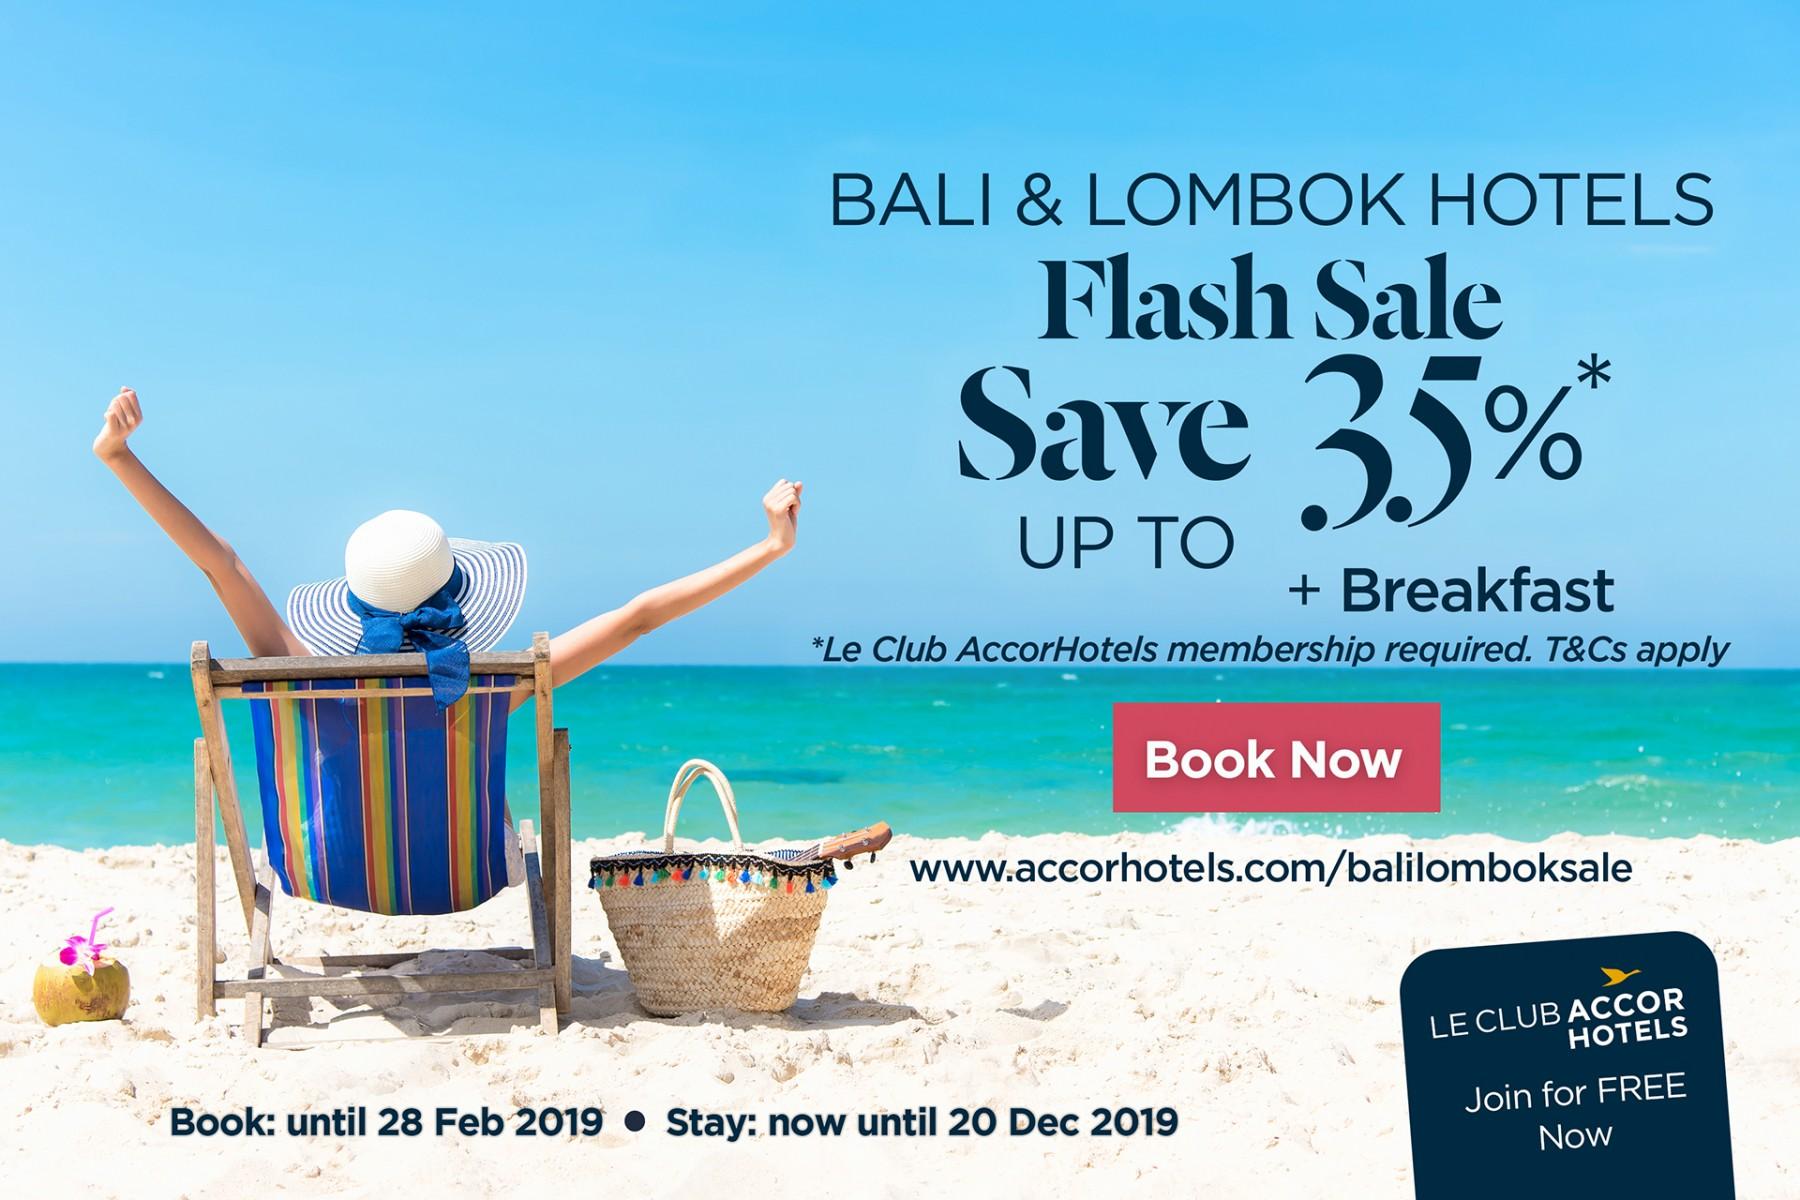 Mercure Bali Sanur Resort Bali Lombok Flash Sale